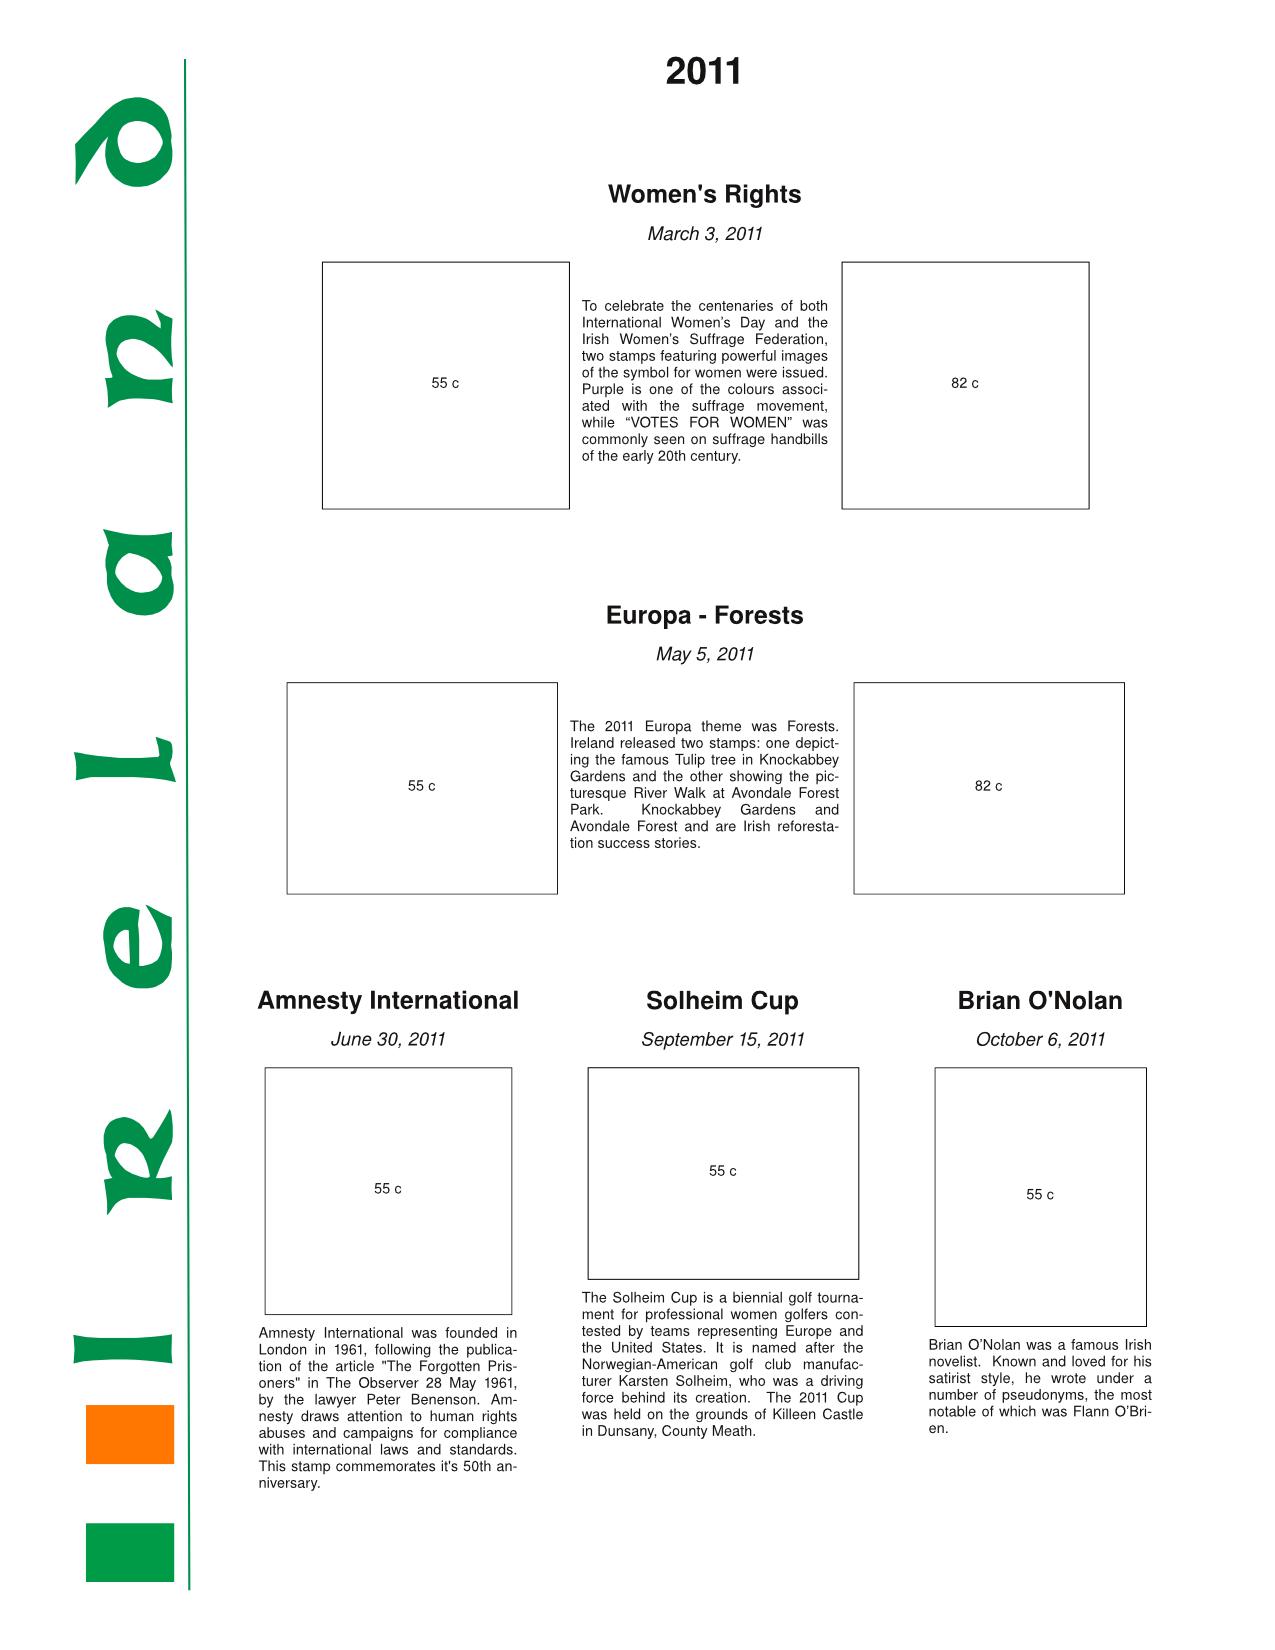 Ireland 2011 - Nimbus Sans L-page002